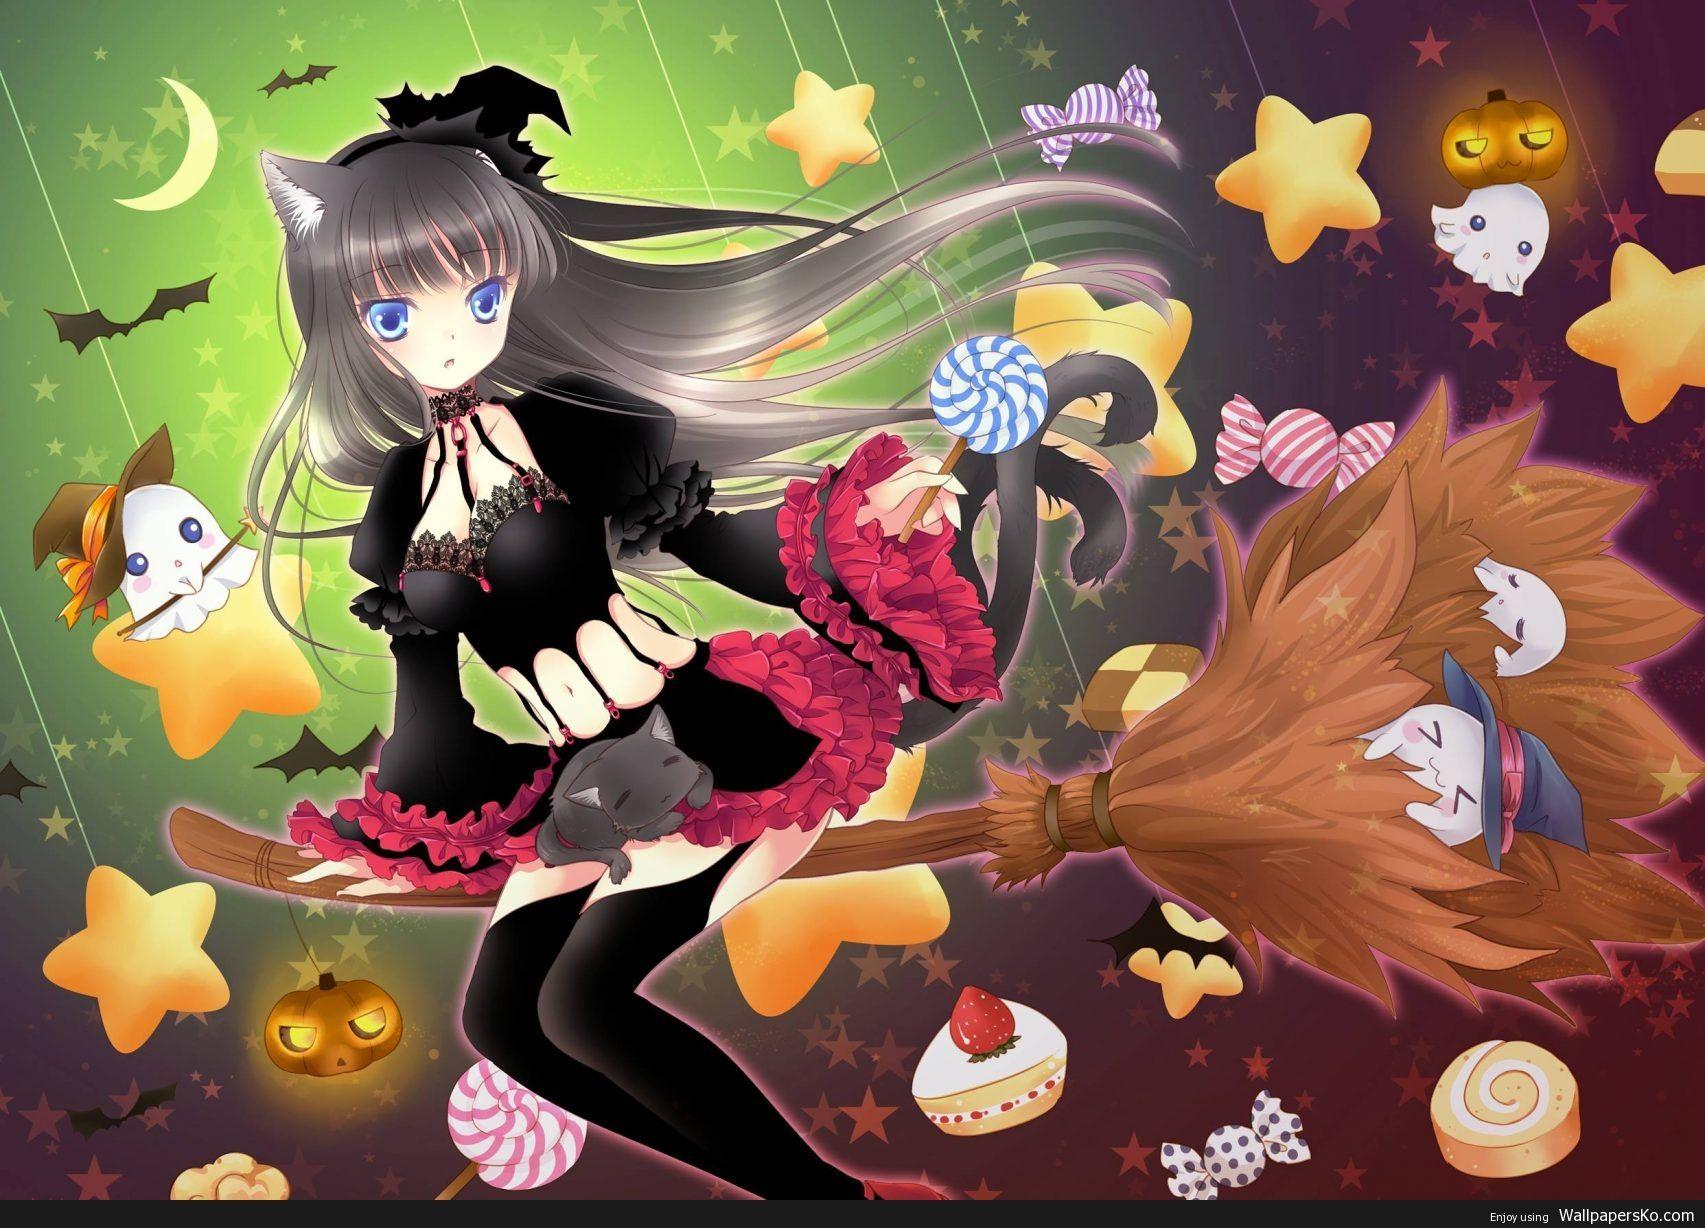 Anime Halloween Wallpaper Hd Http Wallpapersko Com Anime Halloween Wallpaper Hd Html Hd Wallpapers Downloa Anime Halloween Witch Wallpaper Anime Wallpaper Halloween anime wallpaper hd